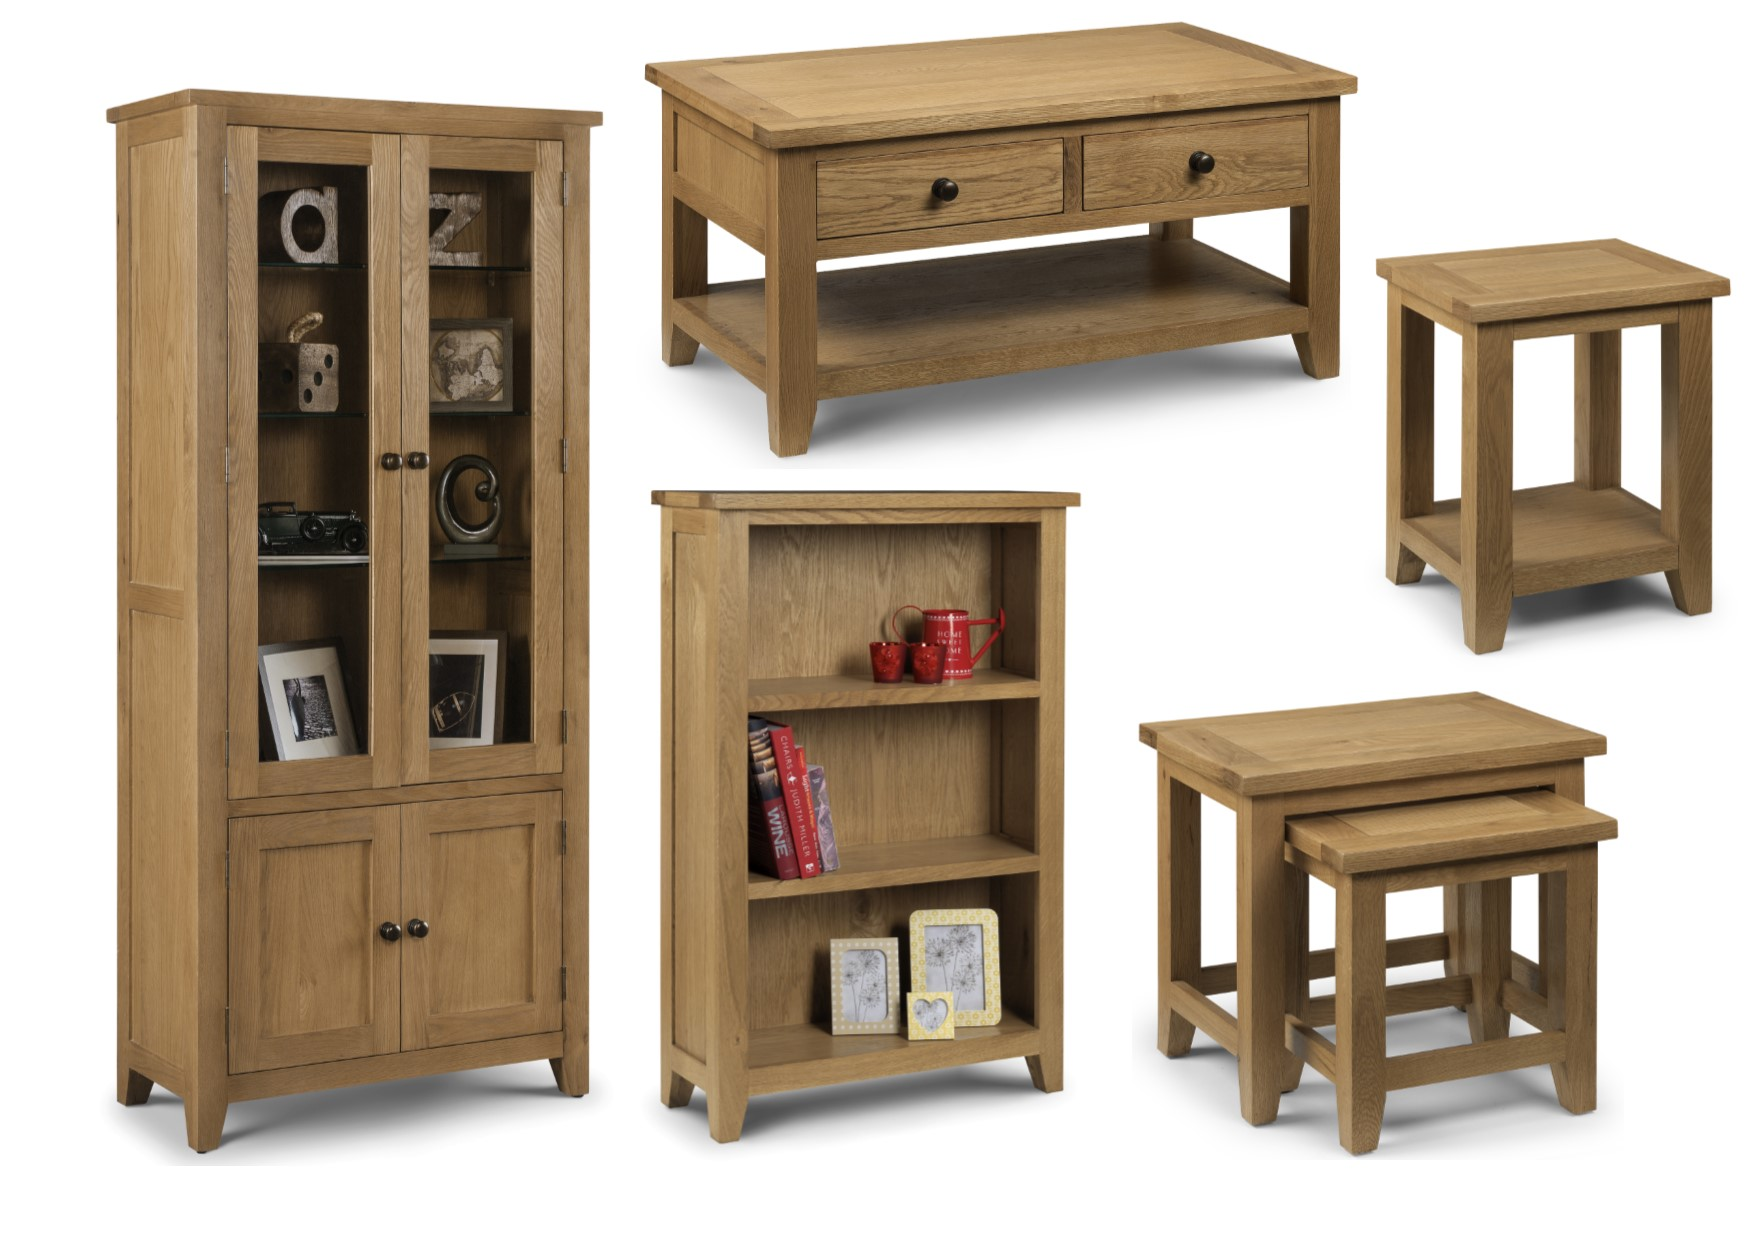 Details About Julian Bowen Astoria Solid Oak Furniture Chunky Table Tv Unit Sideboard Bookcase